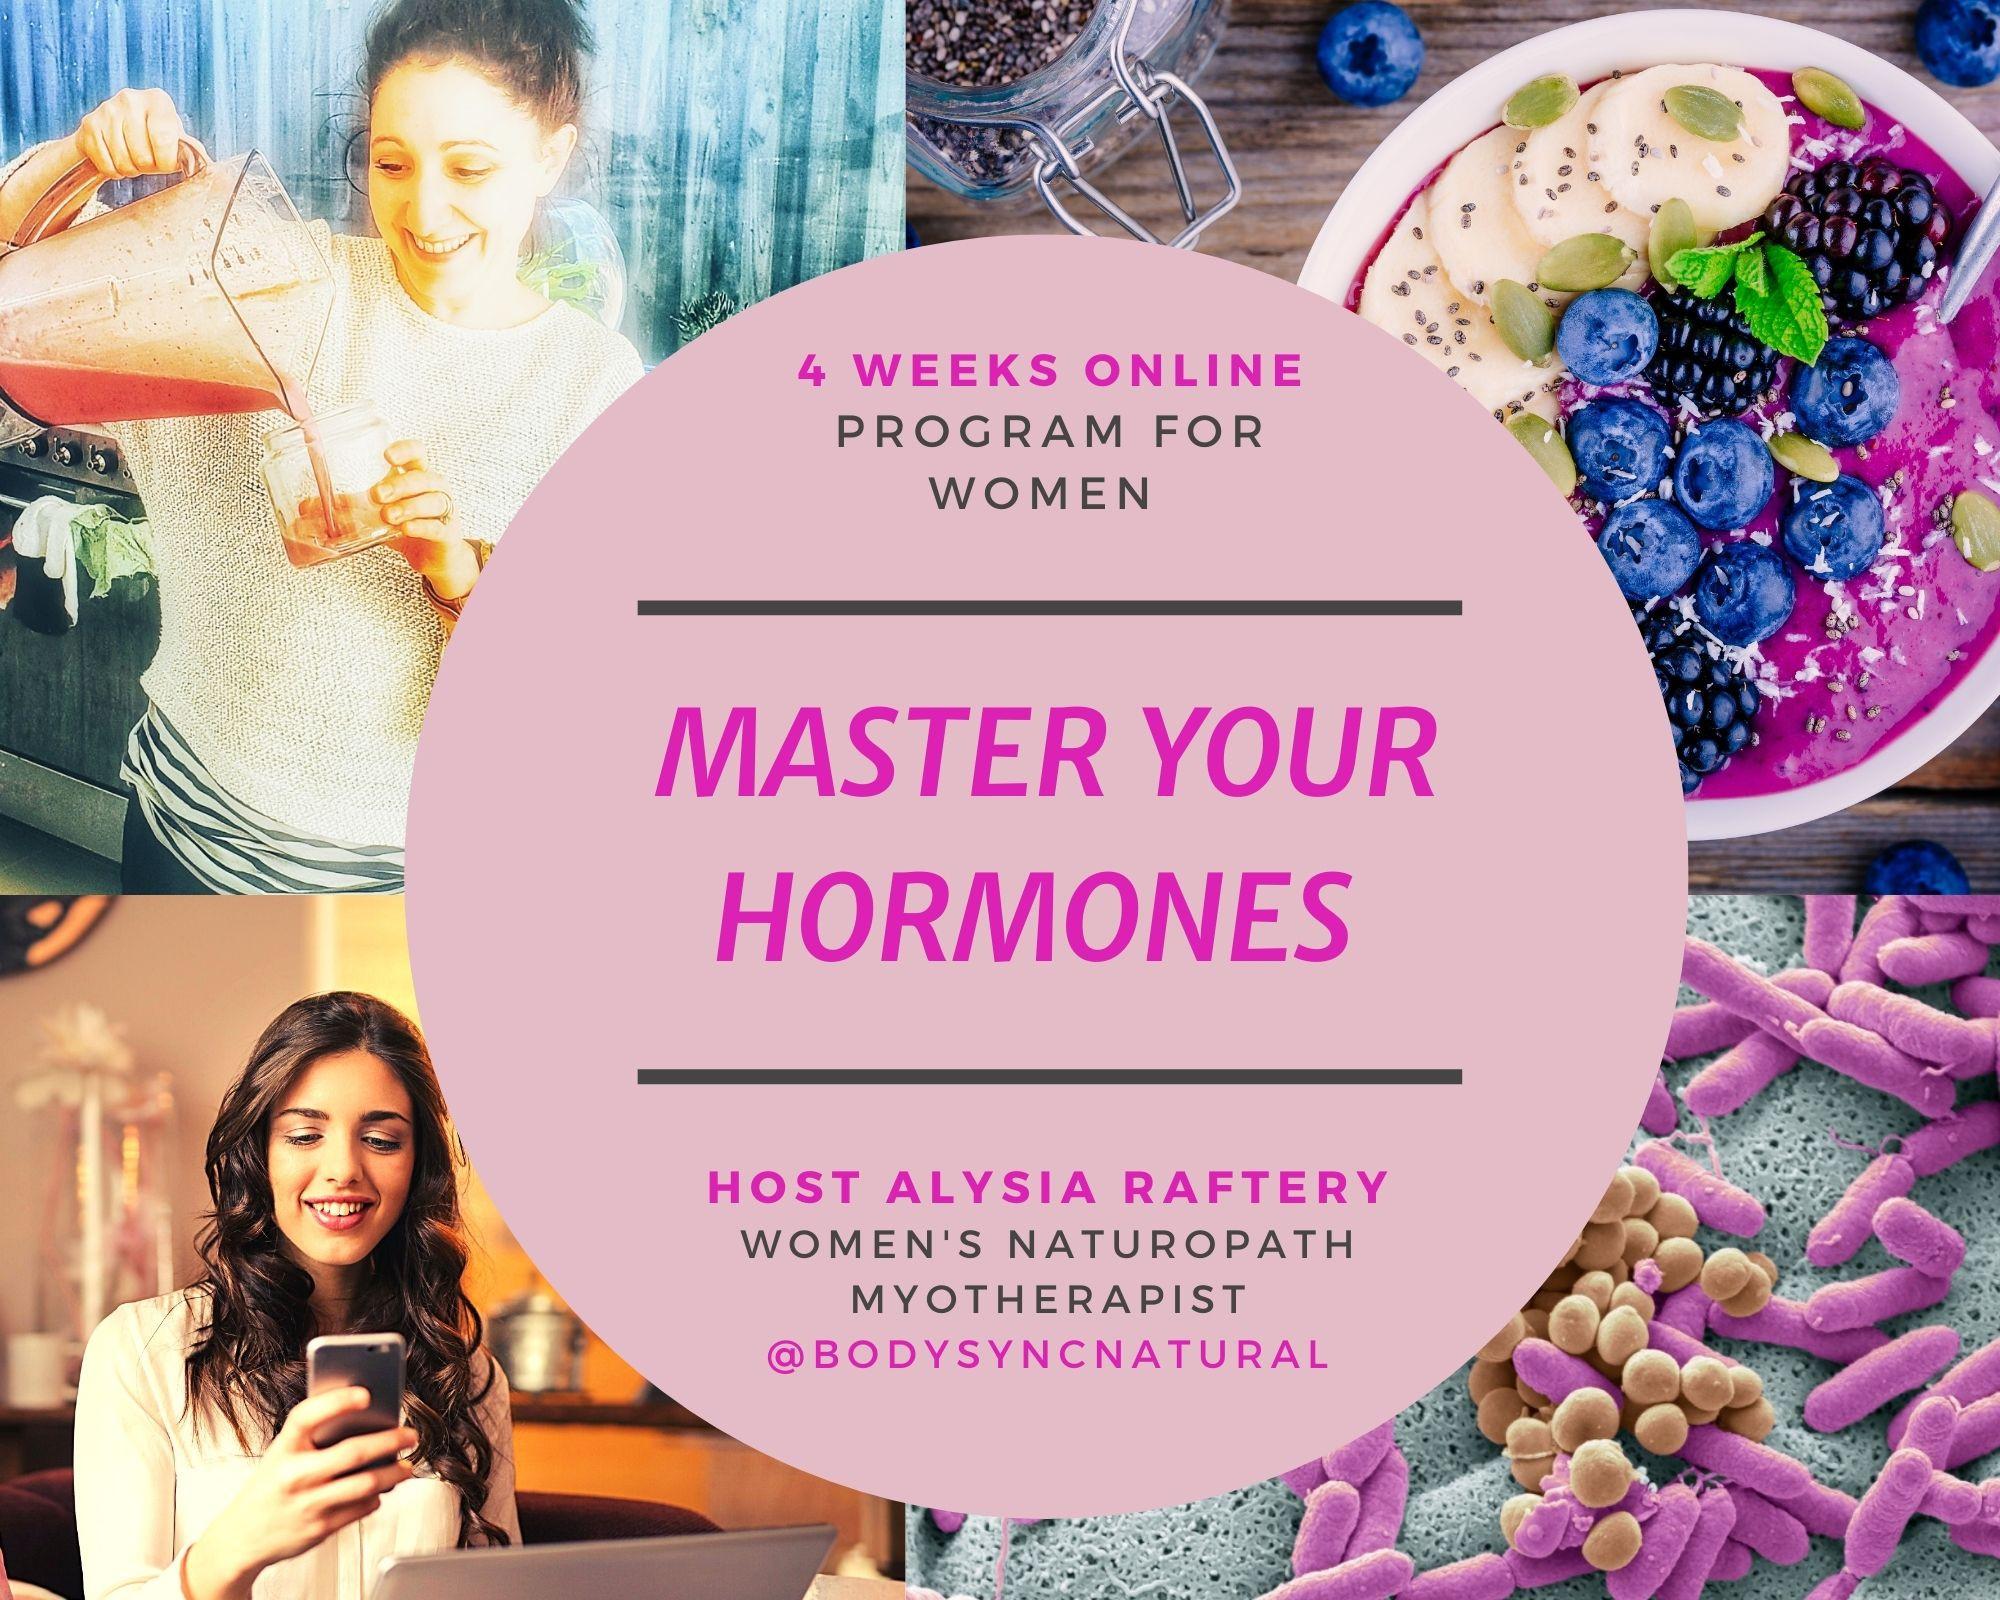 Master Your Hormones Group Program